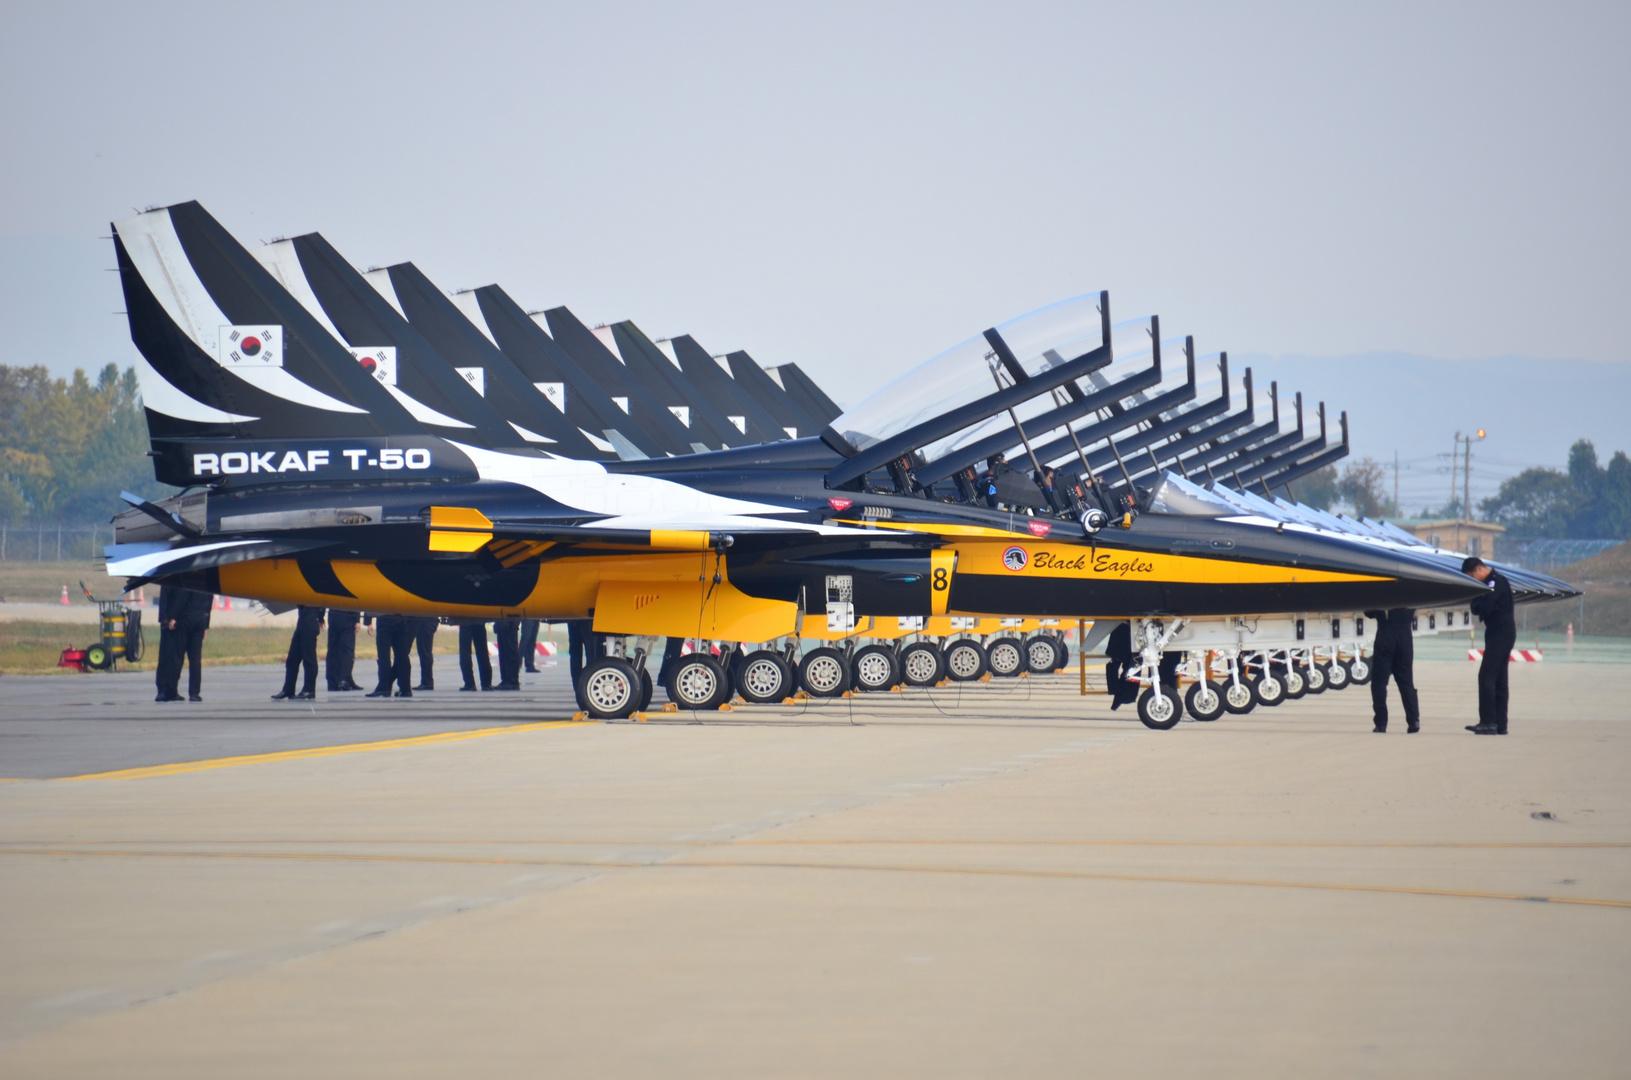 Back Eagles at the air show Osan AFB Korea